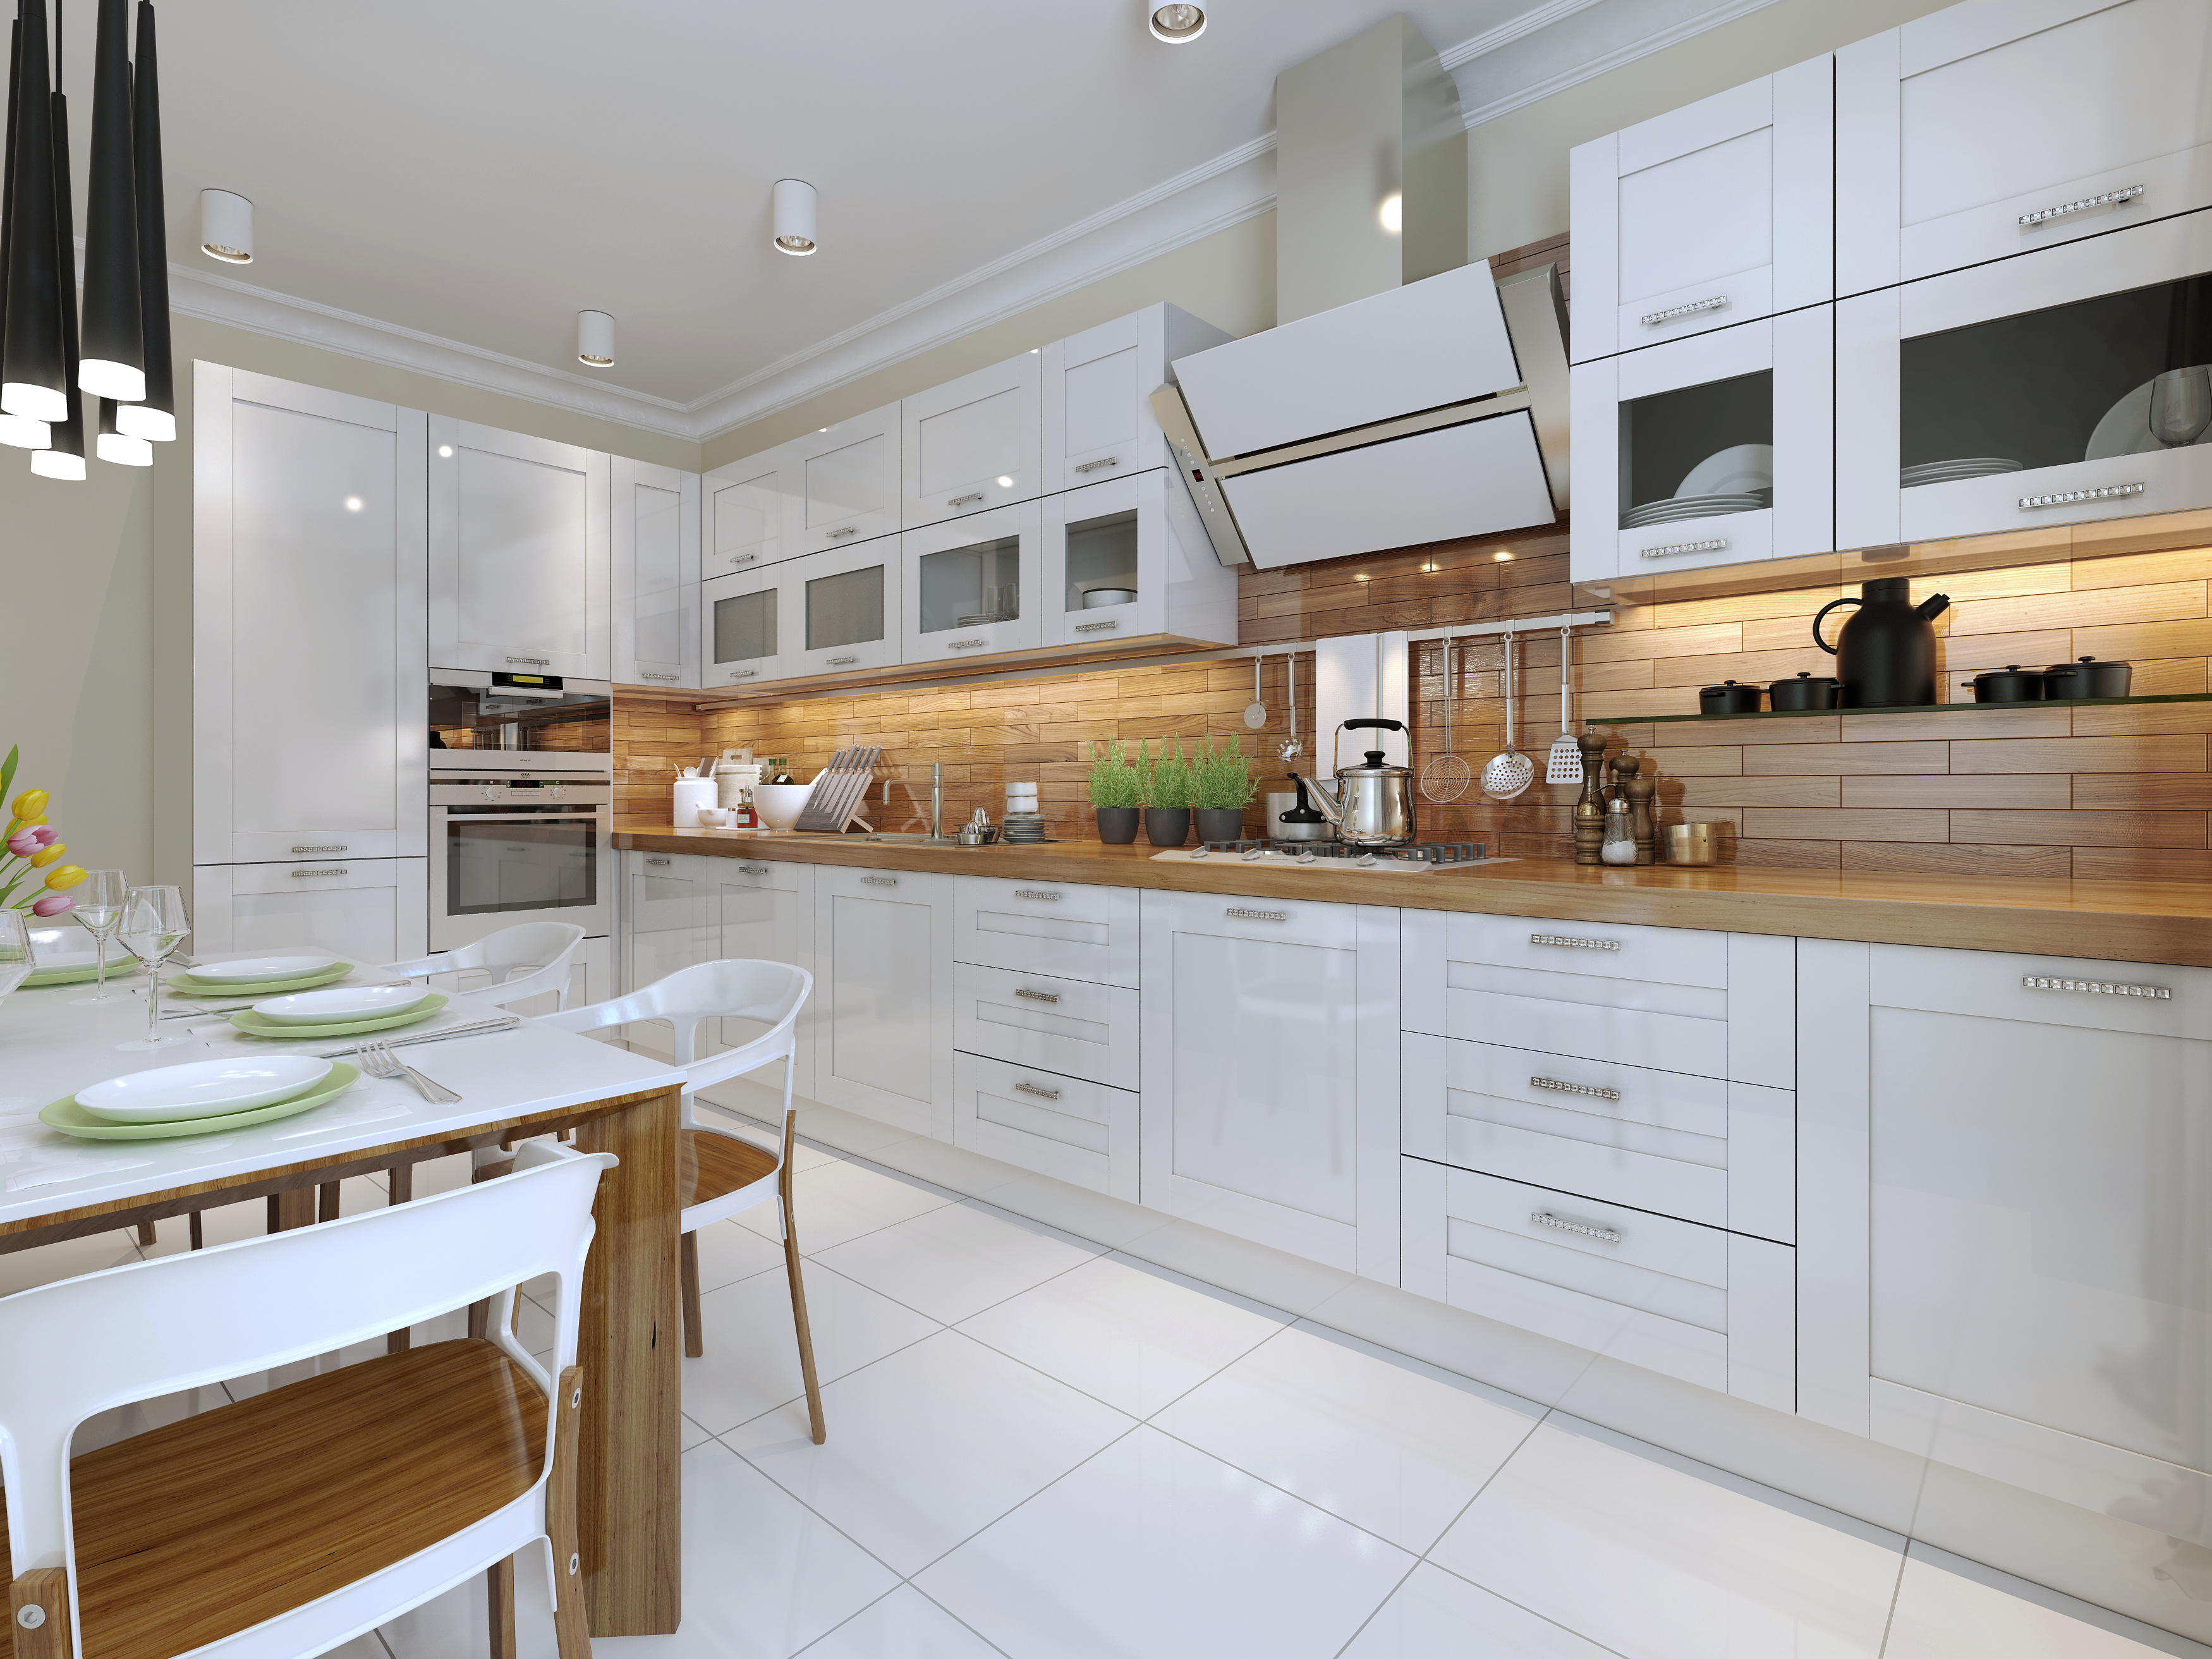 Shaker kitchens cream white classic modern violet designs - modern